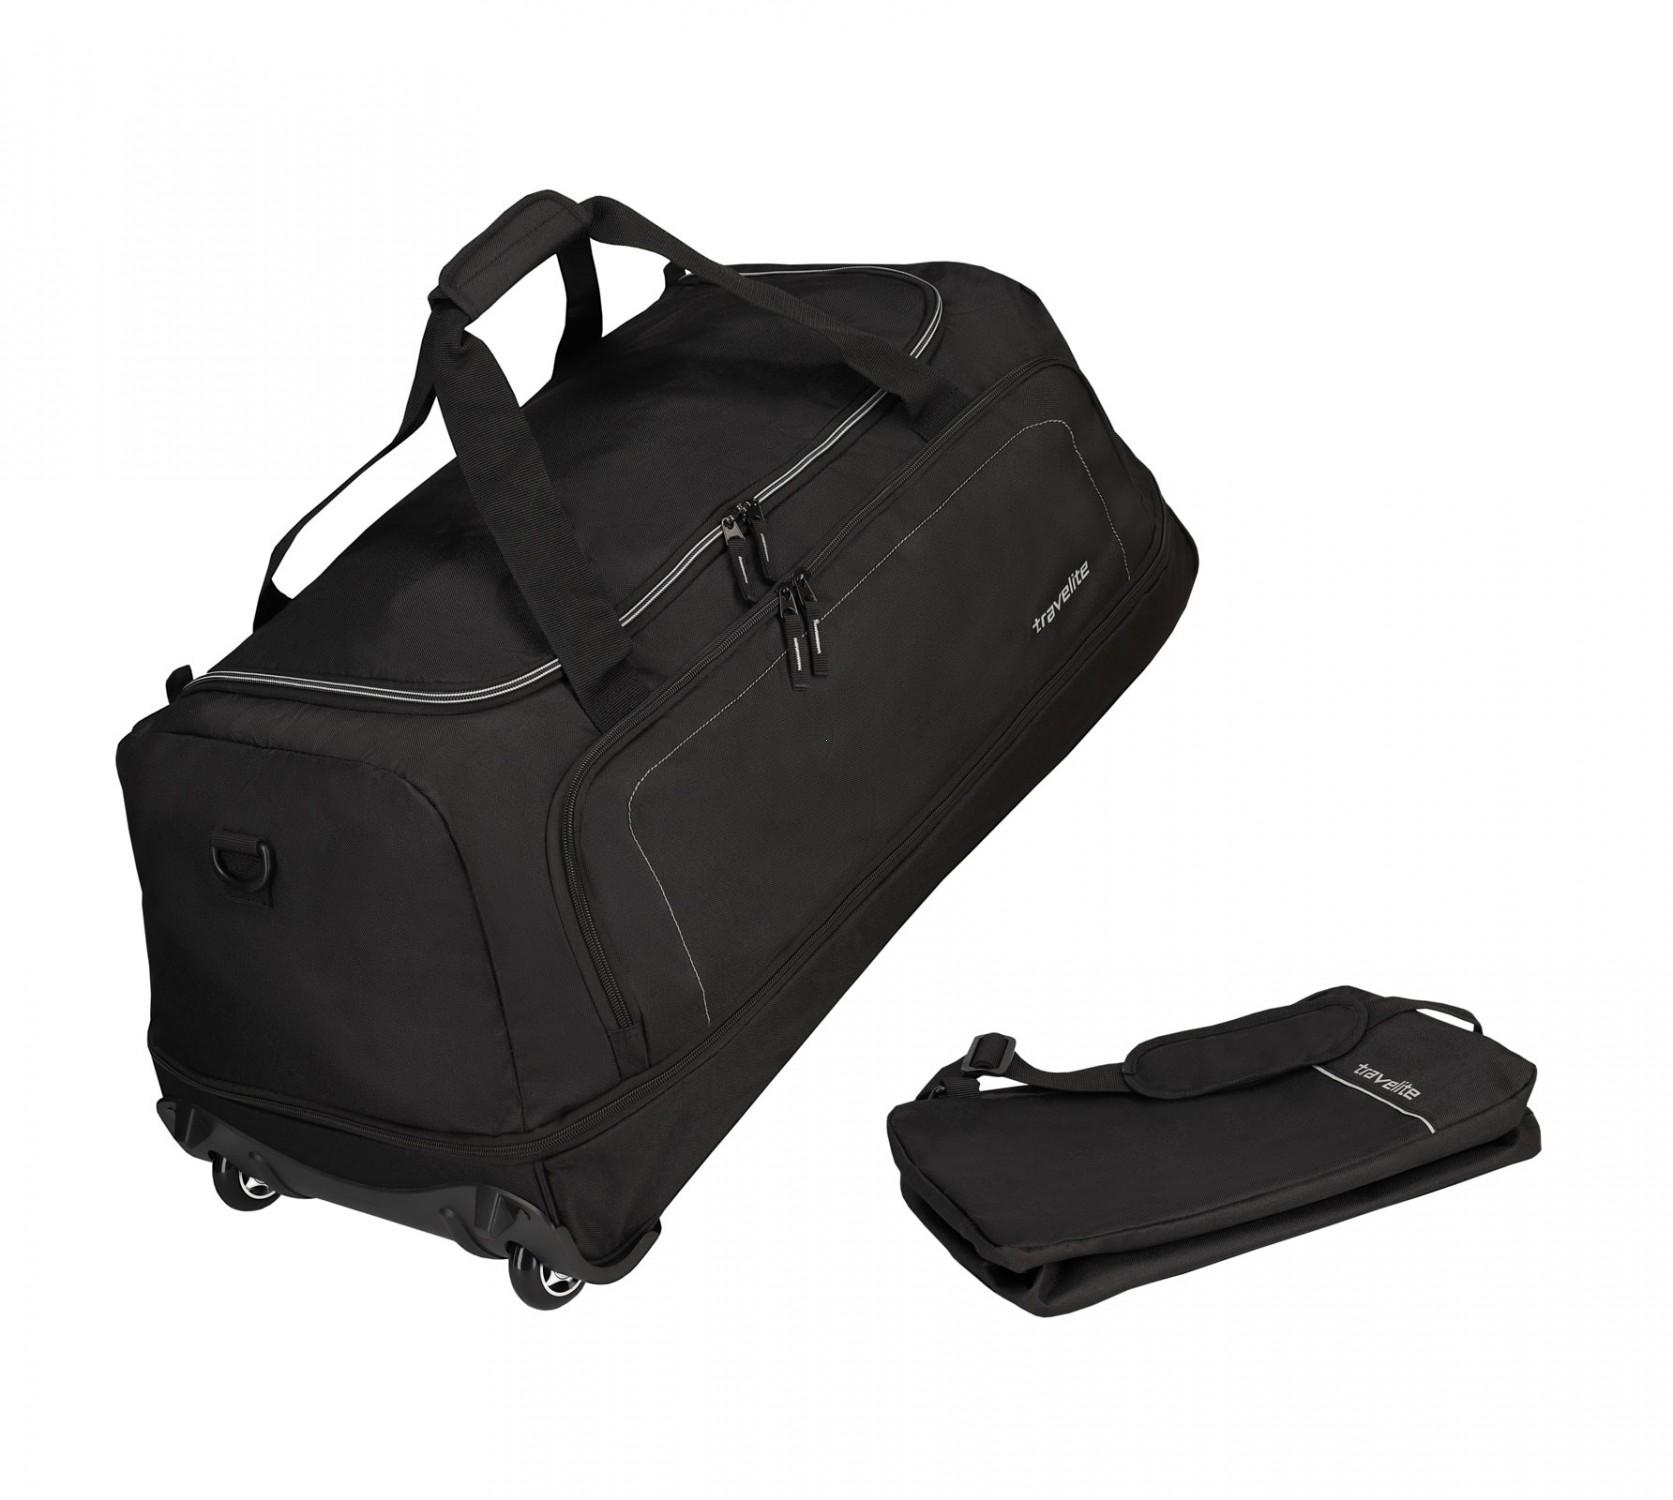 4e22de9e9c582 Travelite Basics Torba podróżna na kółkach składana czarna Walizki i ...